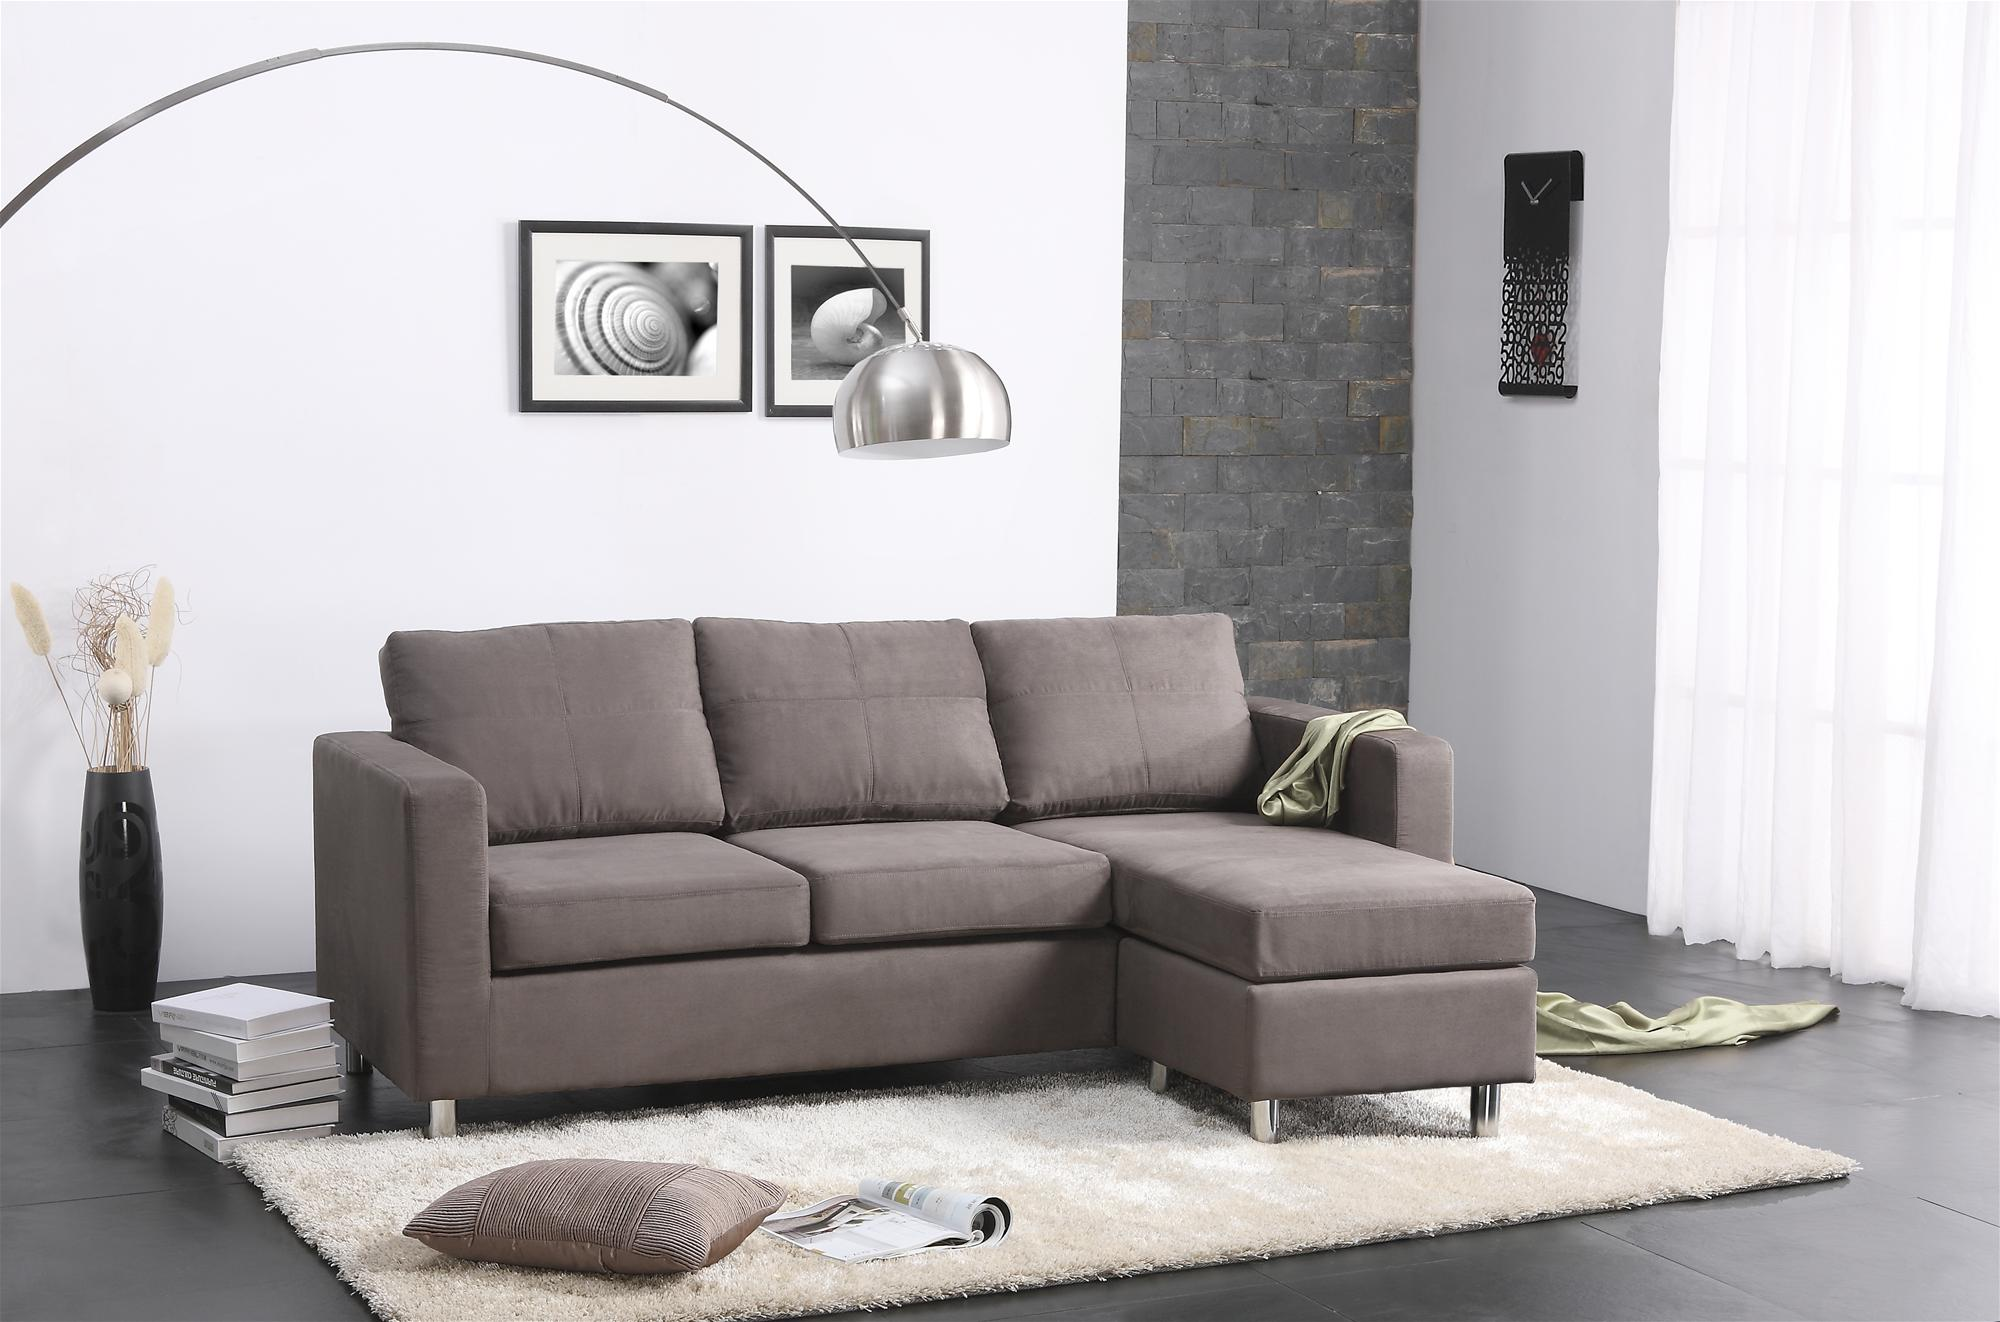 low sofa design super store fire niosh report fabulous contemporary gray color small sectional